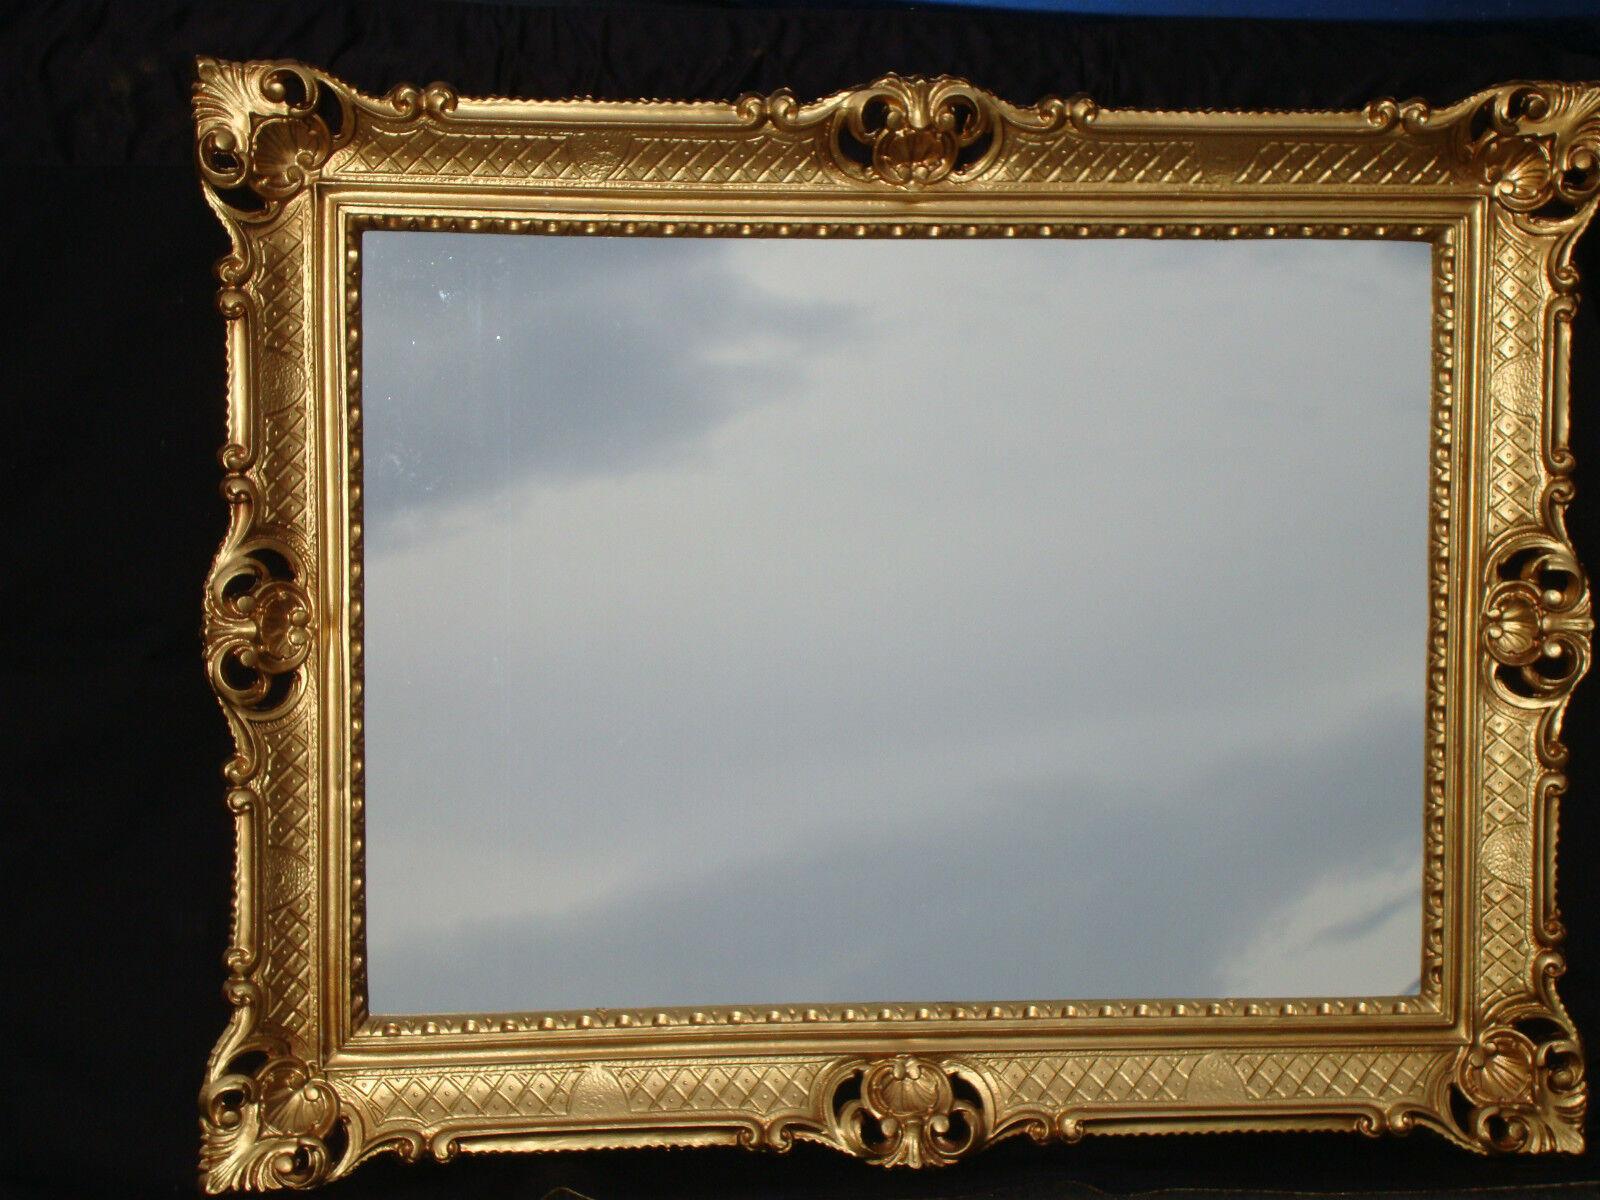 Bilderrahmen 90x70 cm Spiegelrahmen Antik Repro Barock GOLD Rechtkig ...